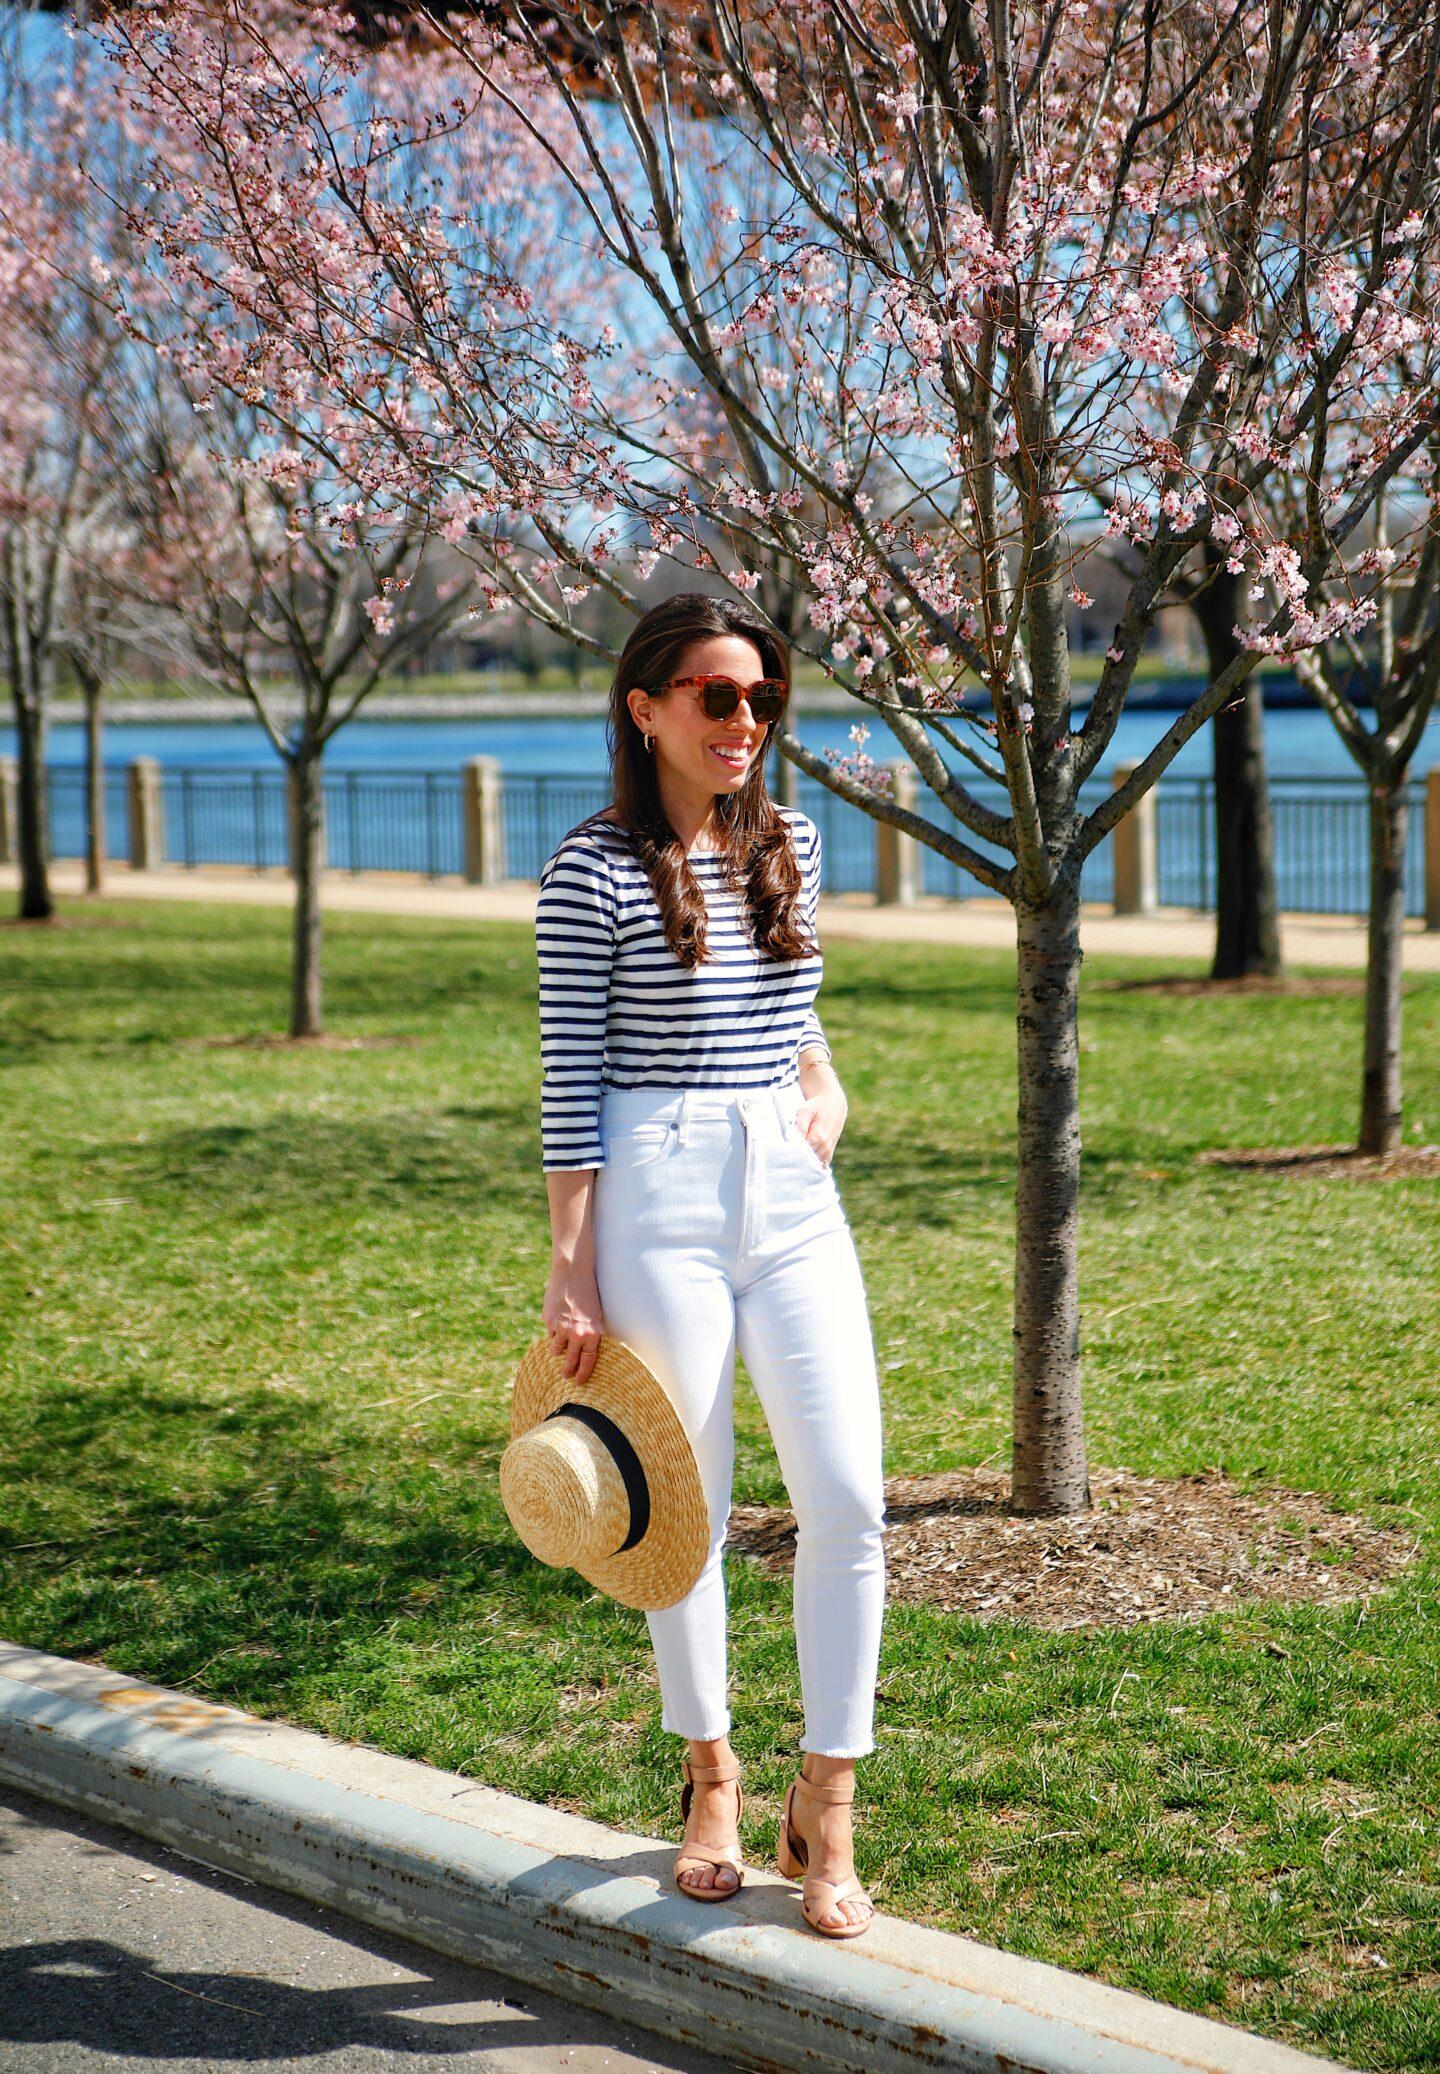 ana-florentina-cherry-blossom-trees-in-new-york-city